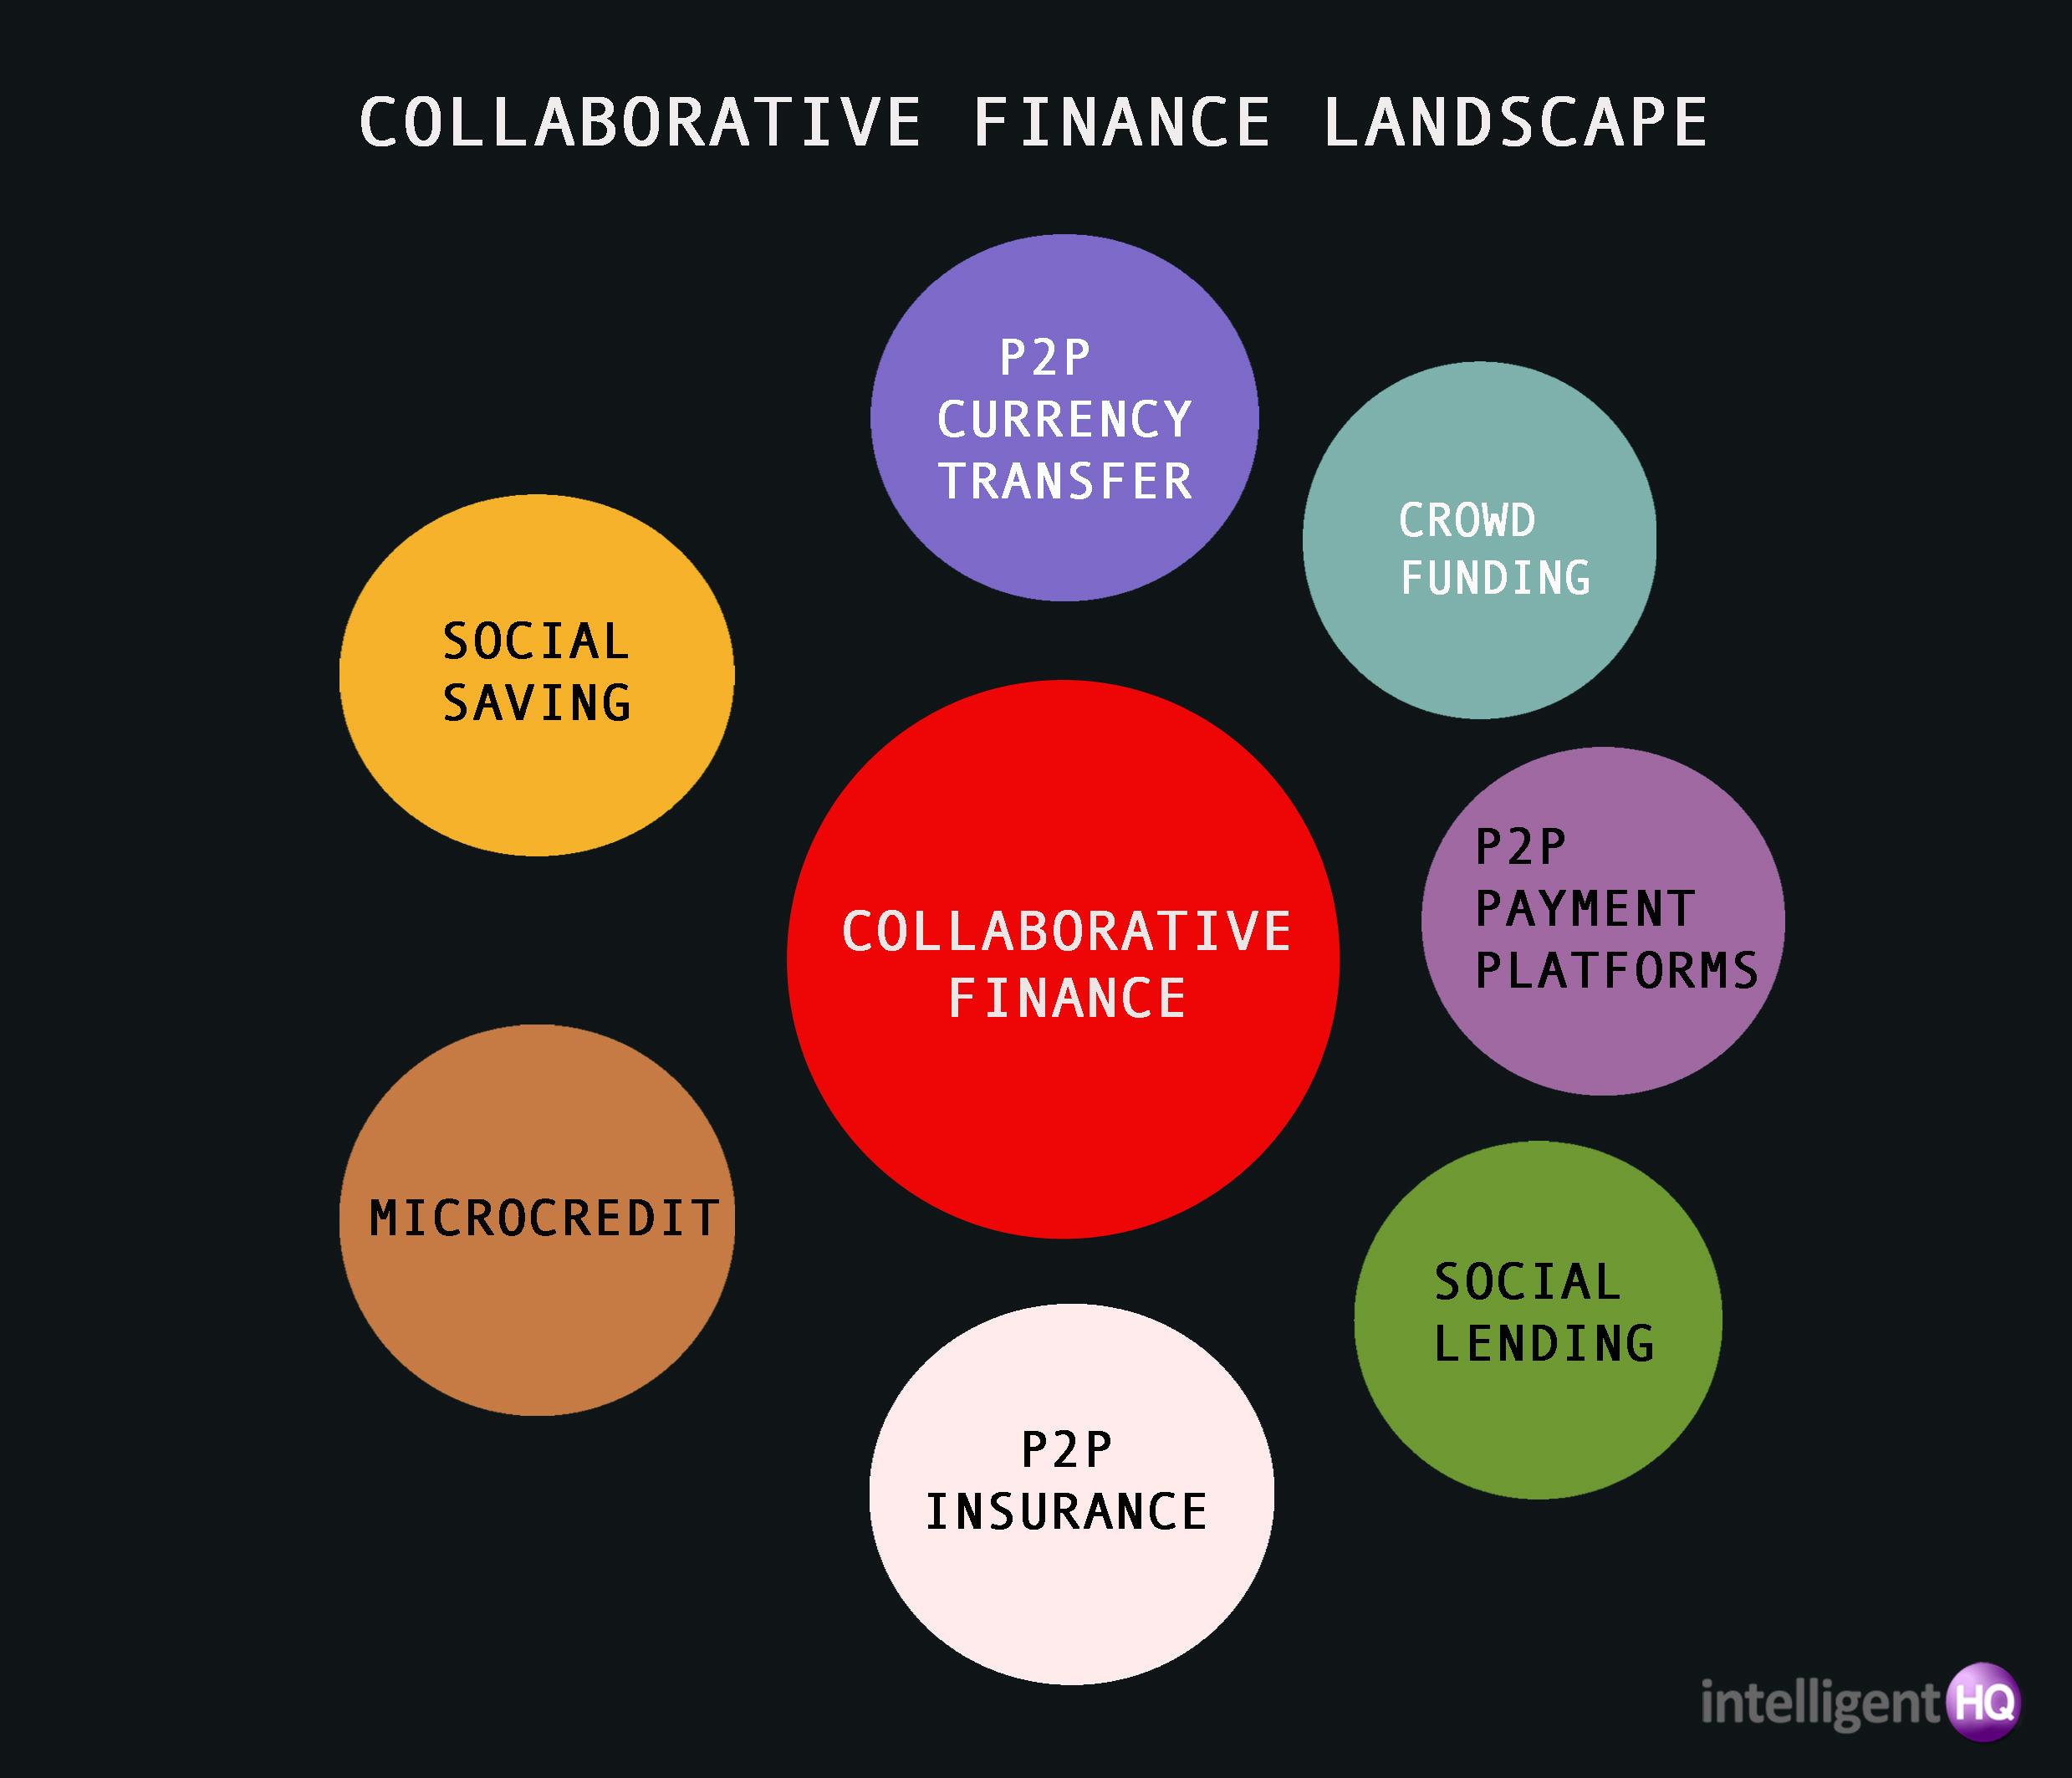 collaborative finance Intelligenthq